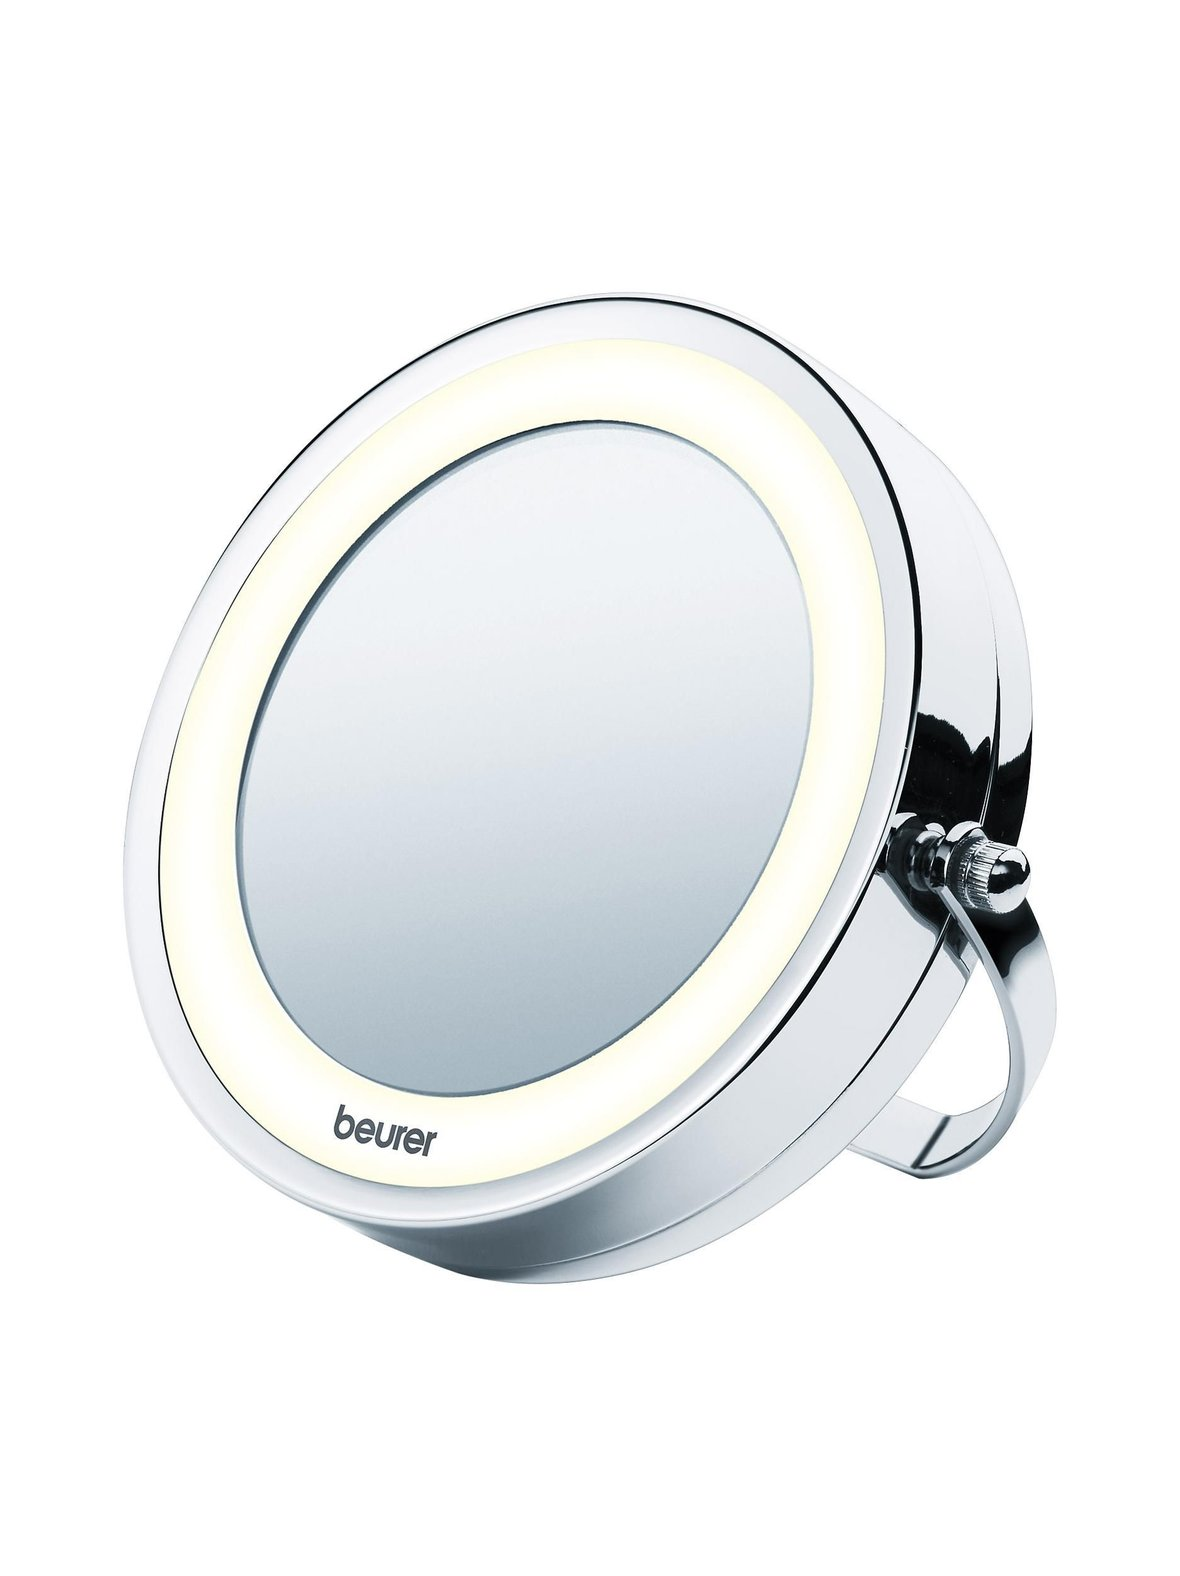 Swarovski Crystalized 5x suurentava meikkipeili